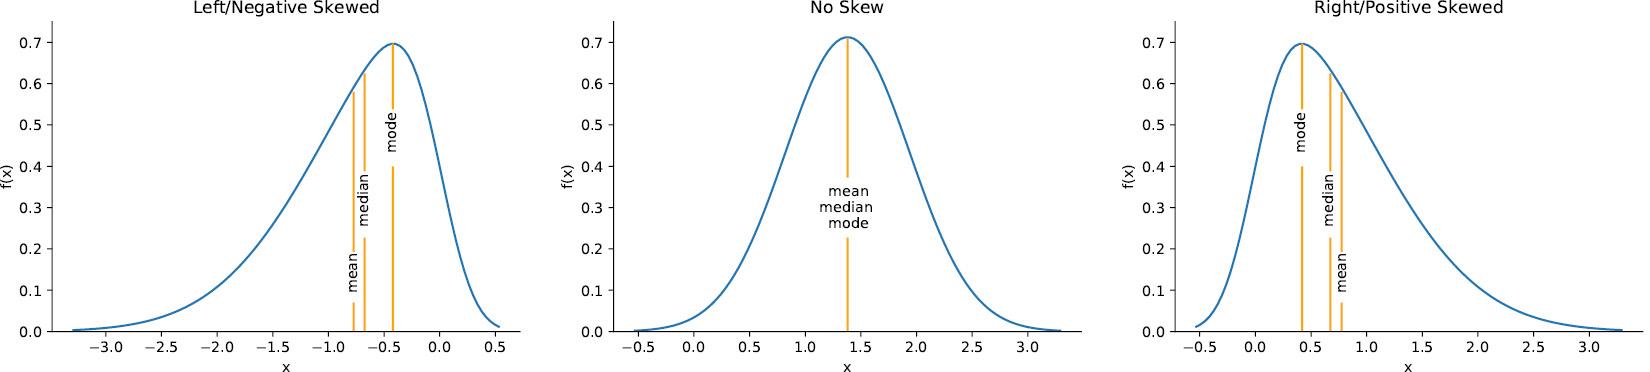 Figure 1.9 – Visualizing skew